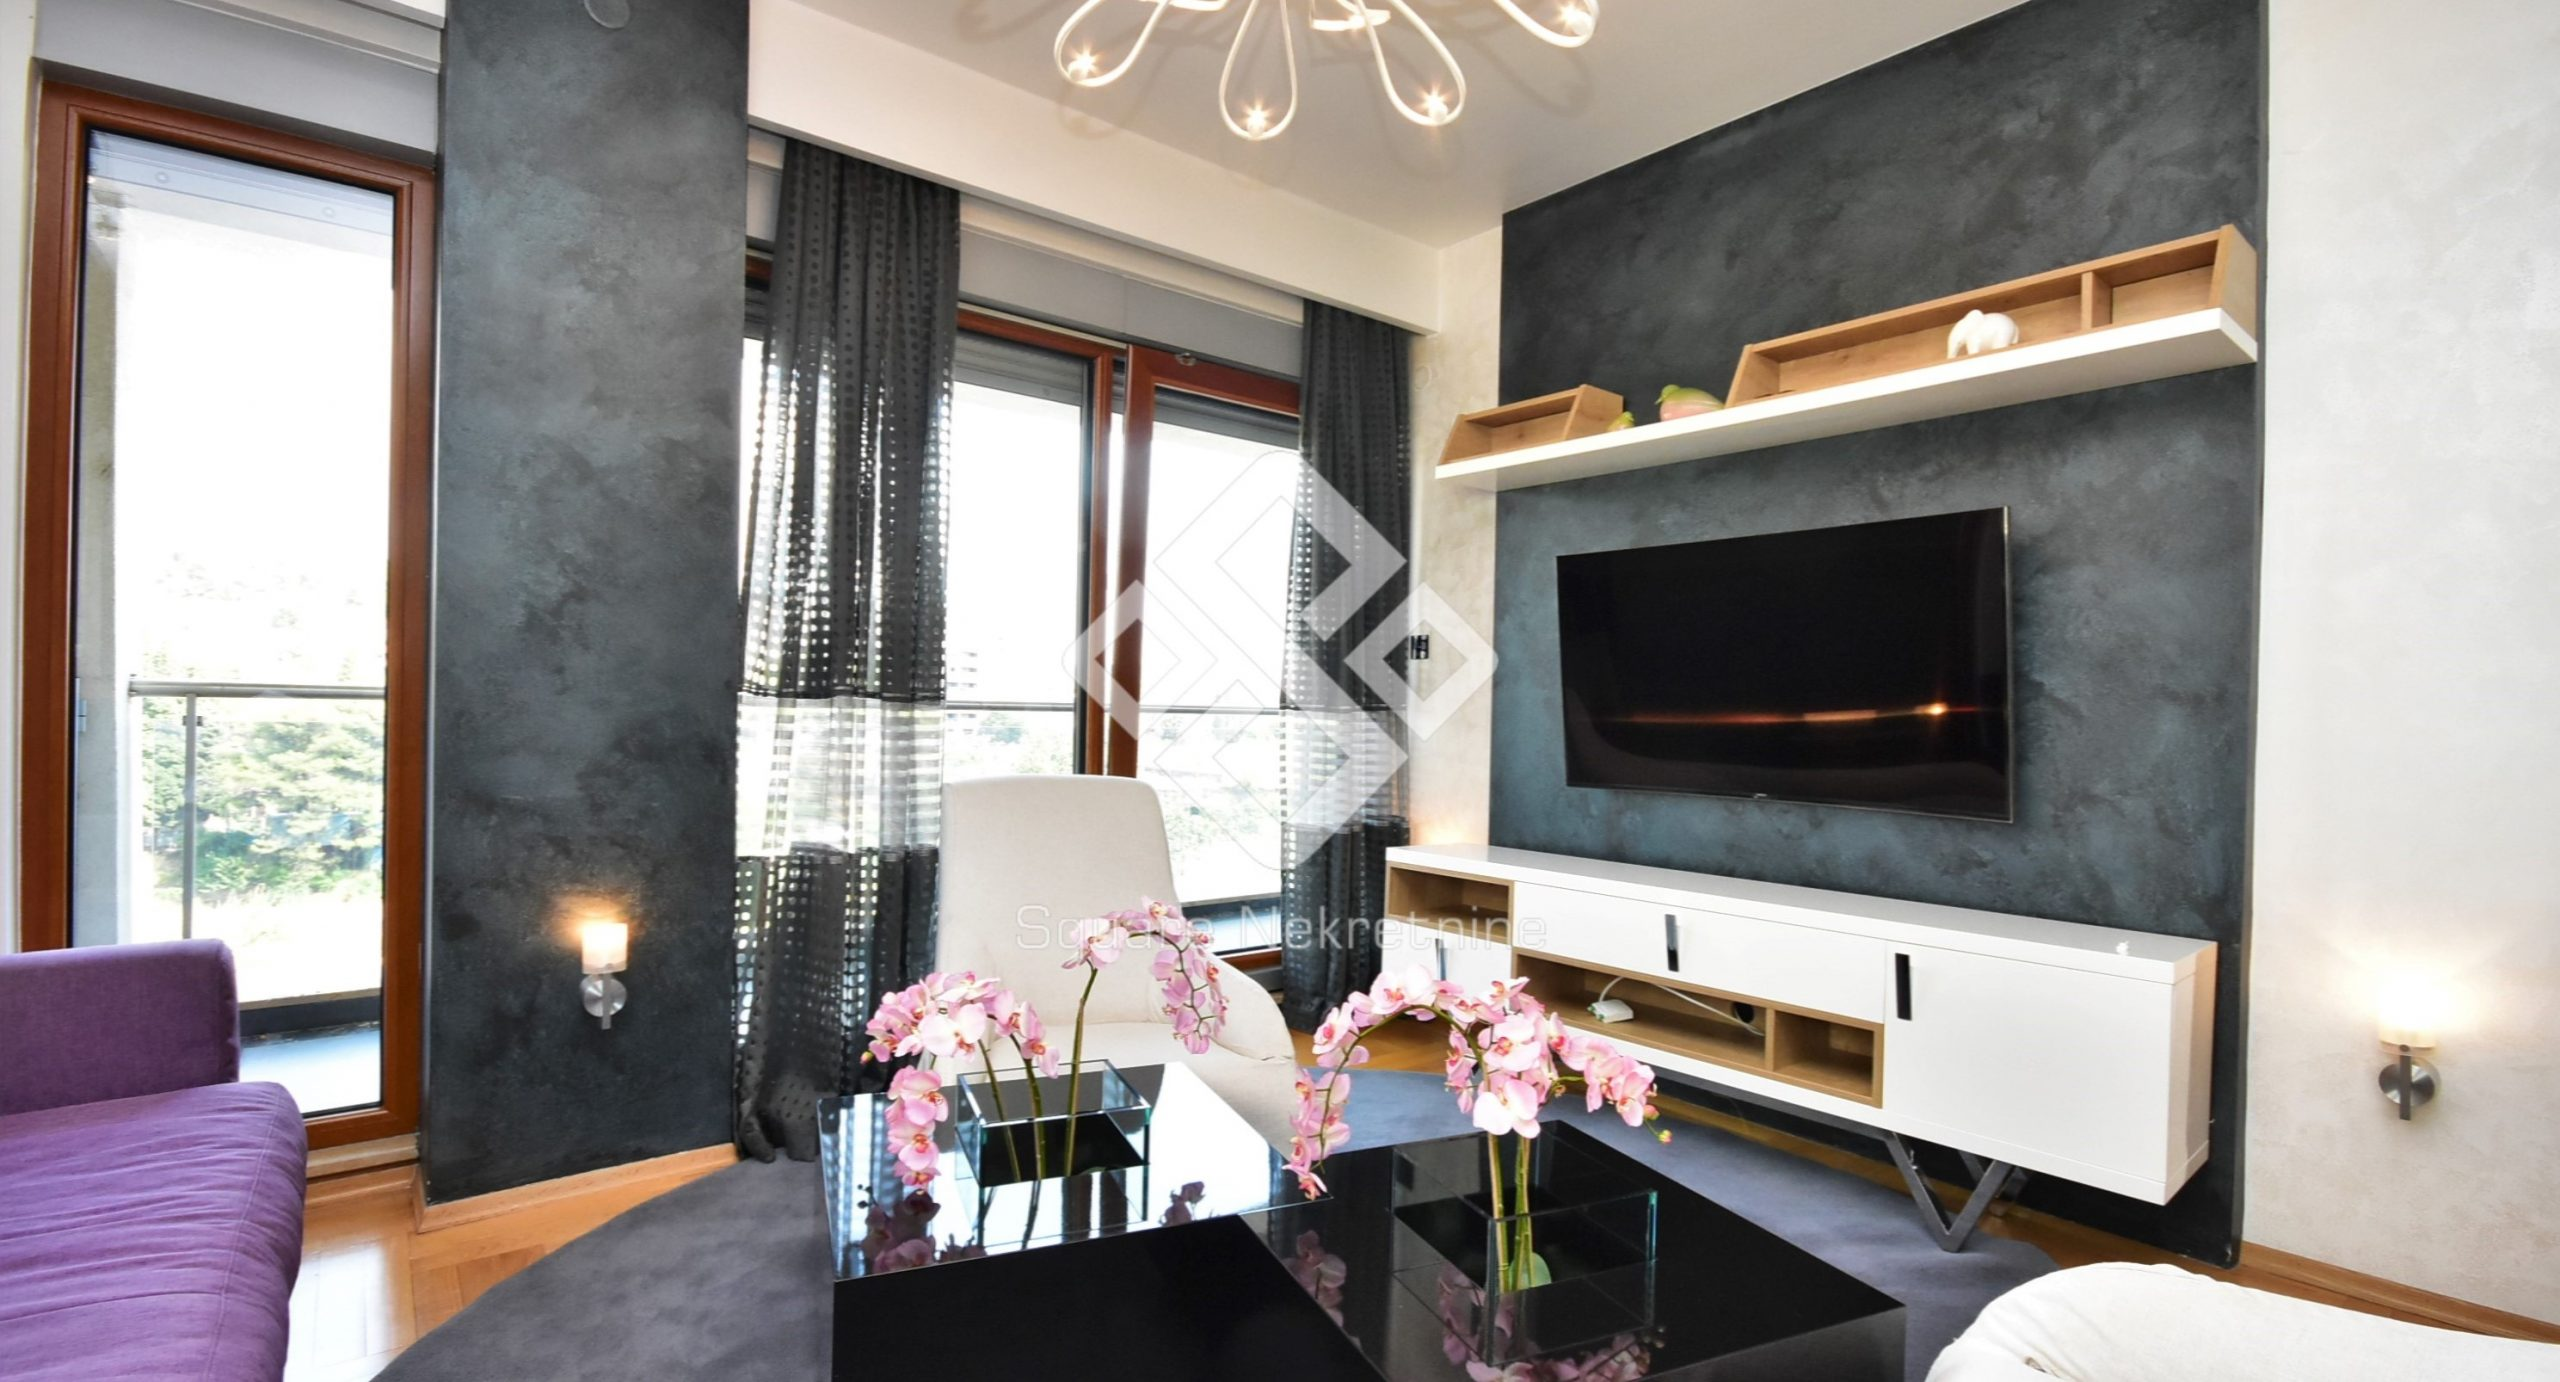 Dvosoban stan 72m2, lux namjesten + garaza, Preko Morace